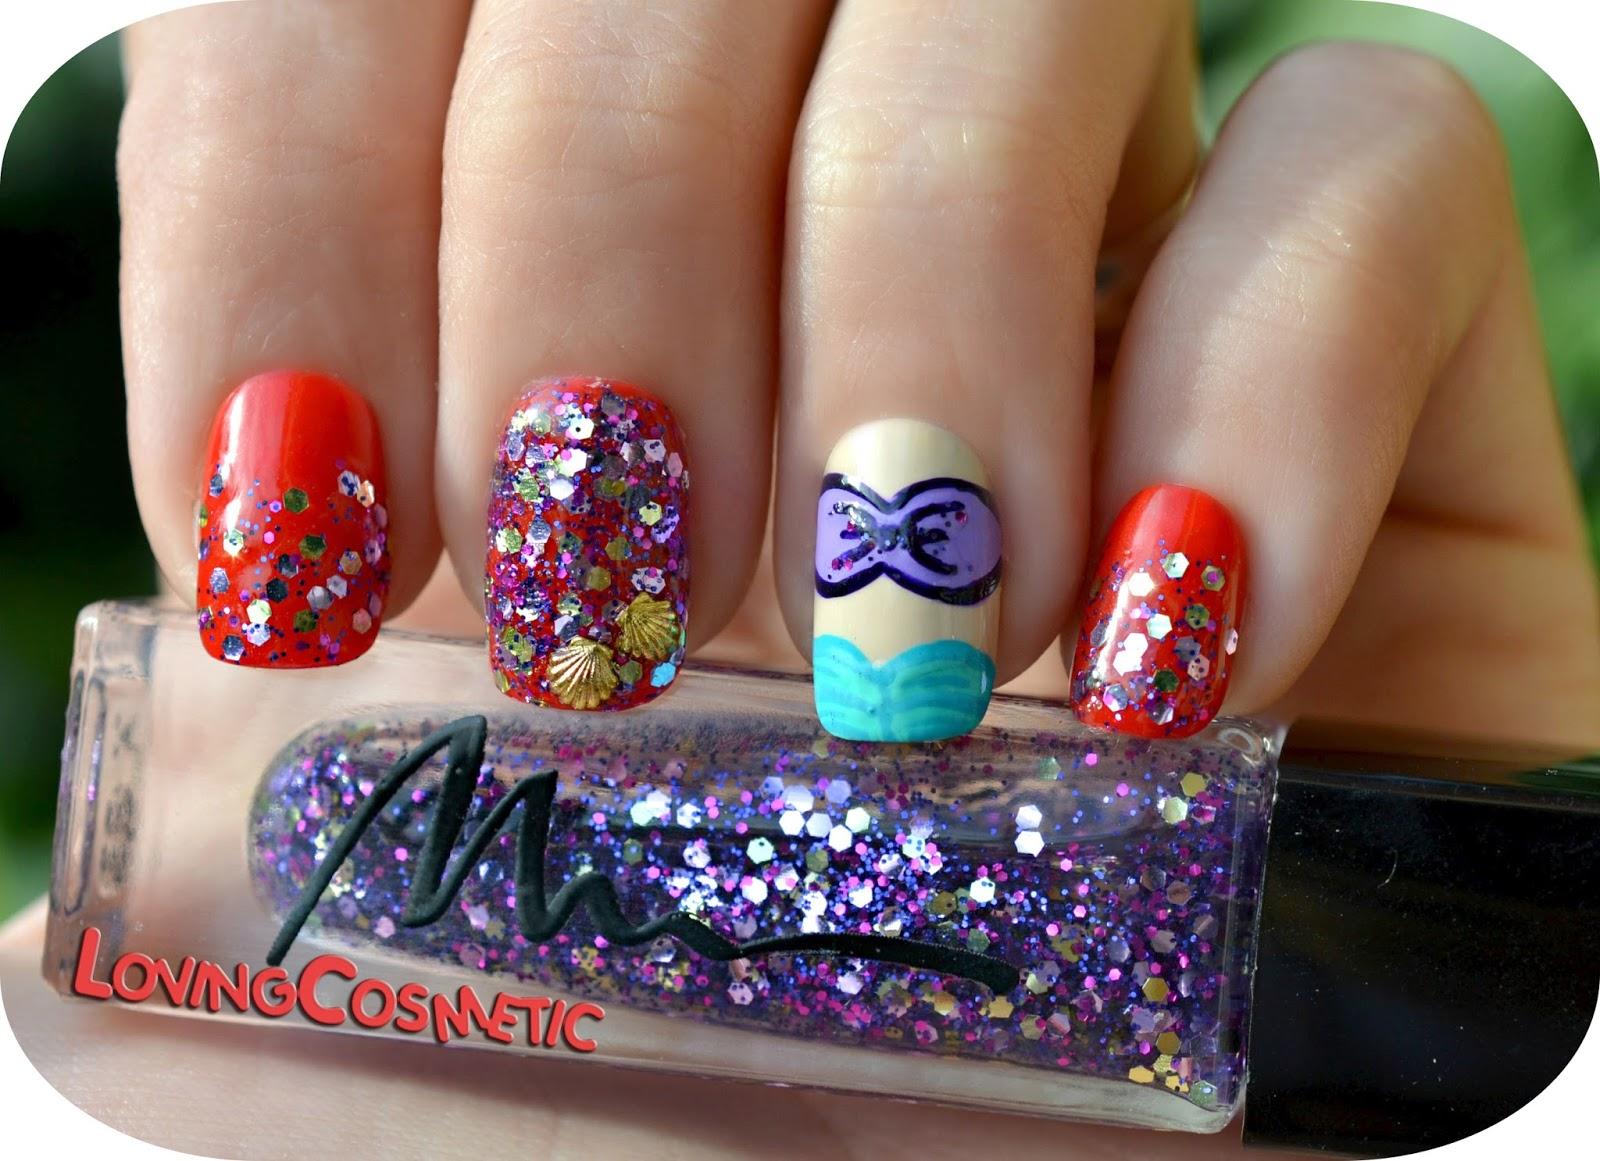 Manicura La Sirenita, Mermaid Nails, nail art uñas uña shell glitter marionnaud sirena